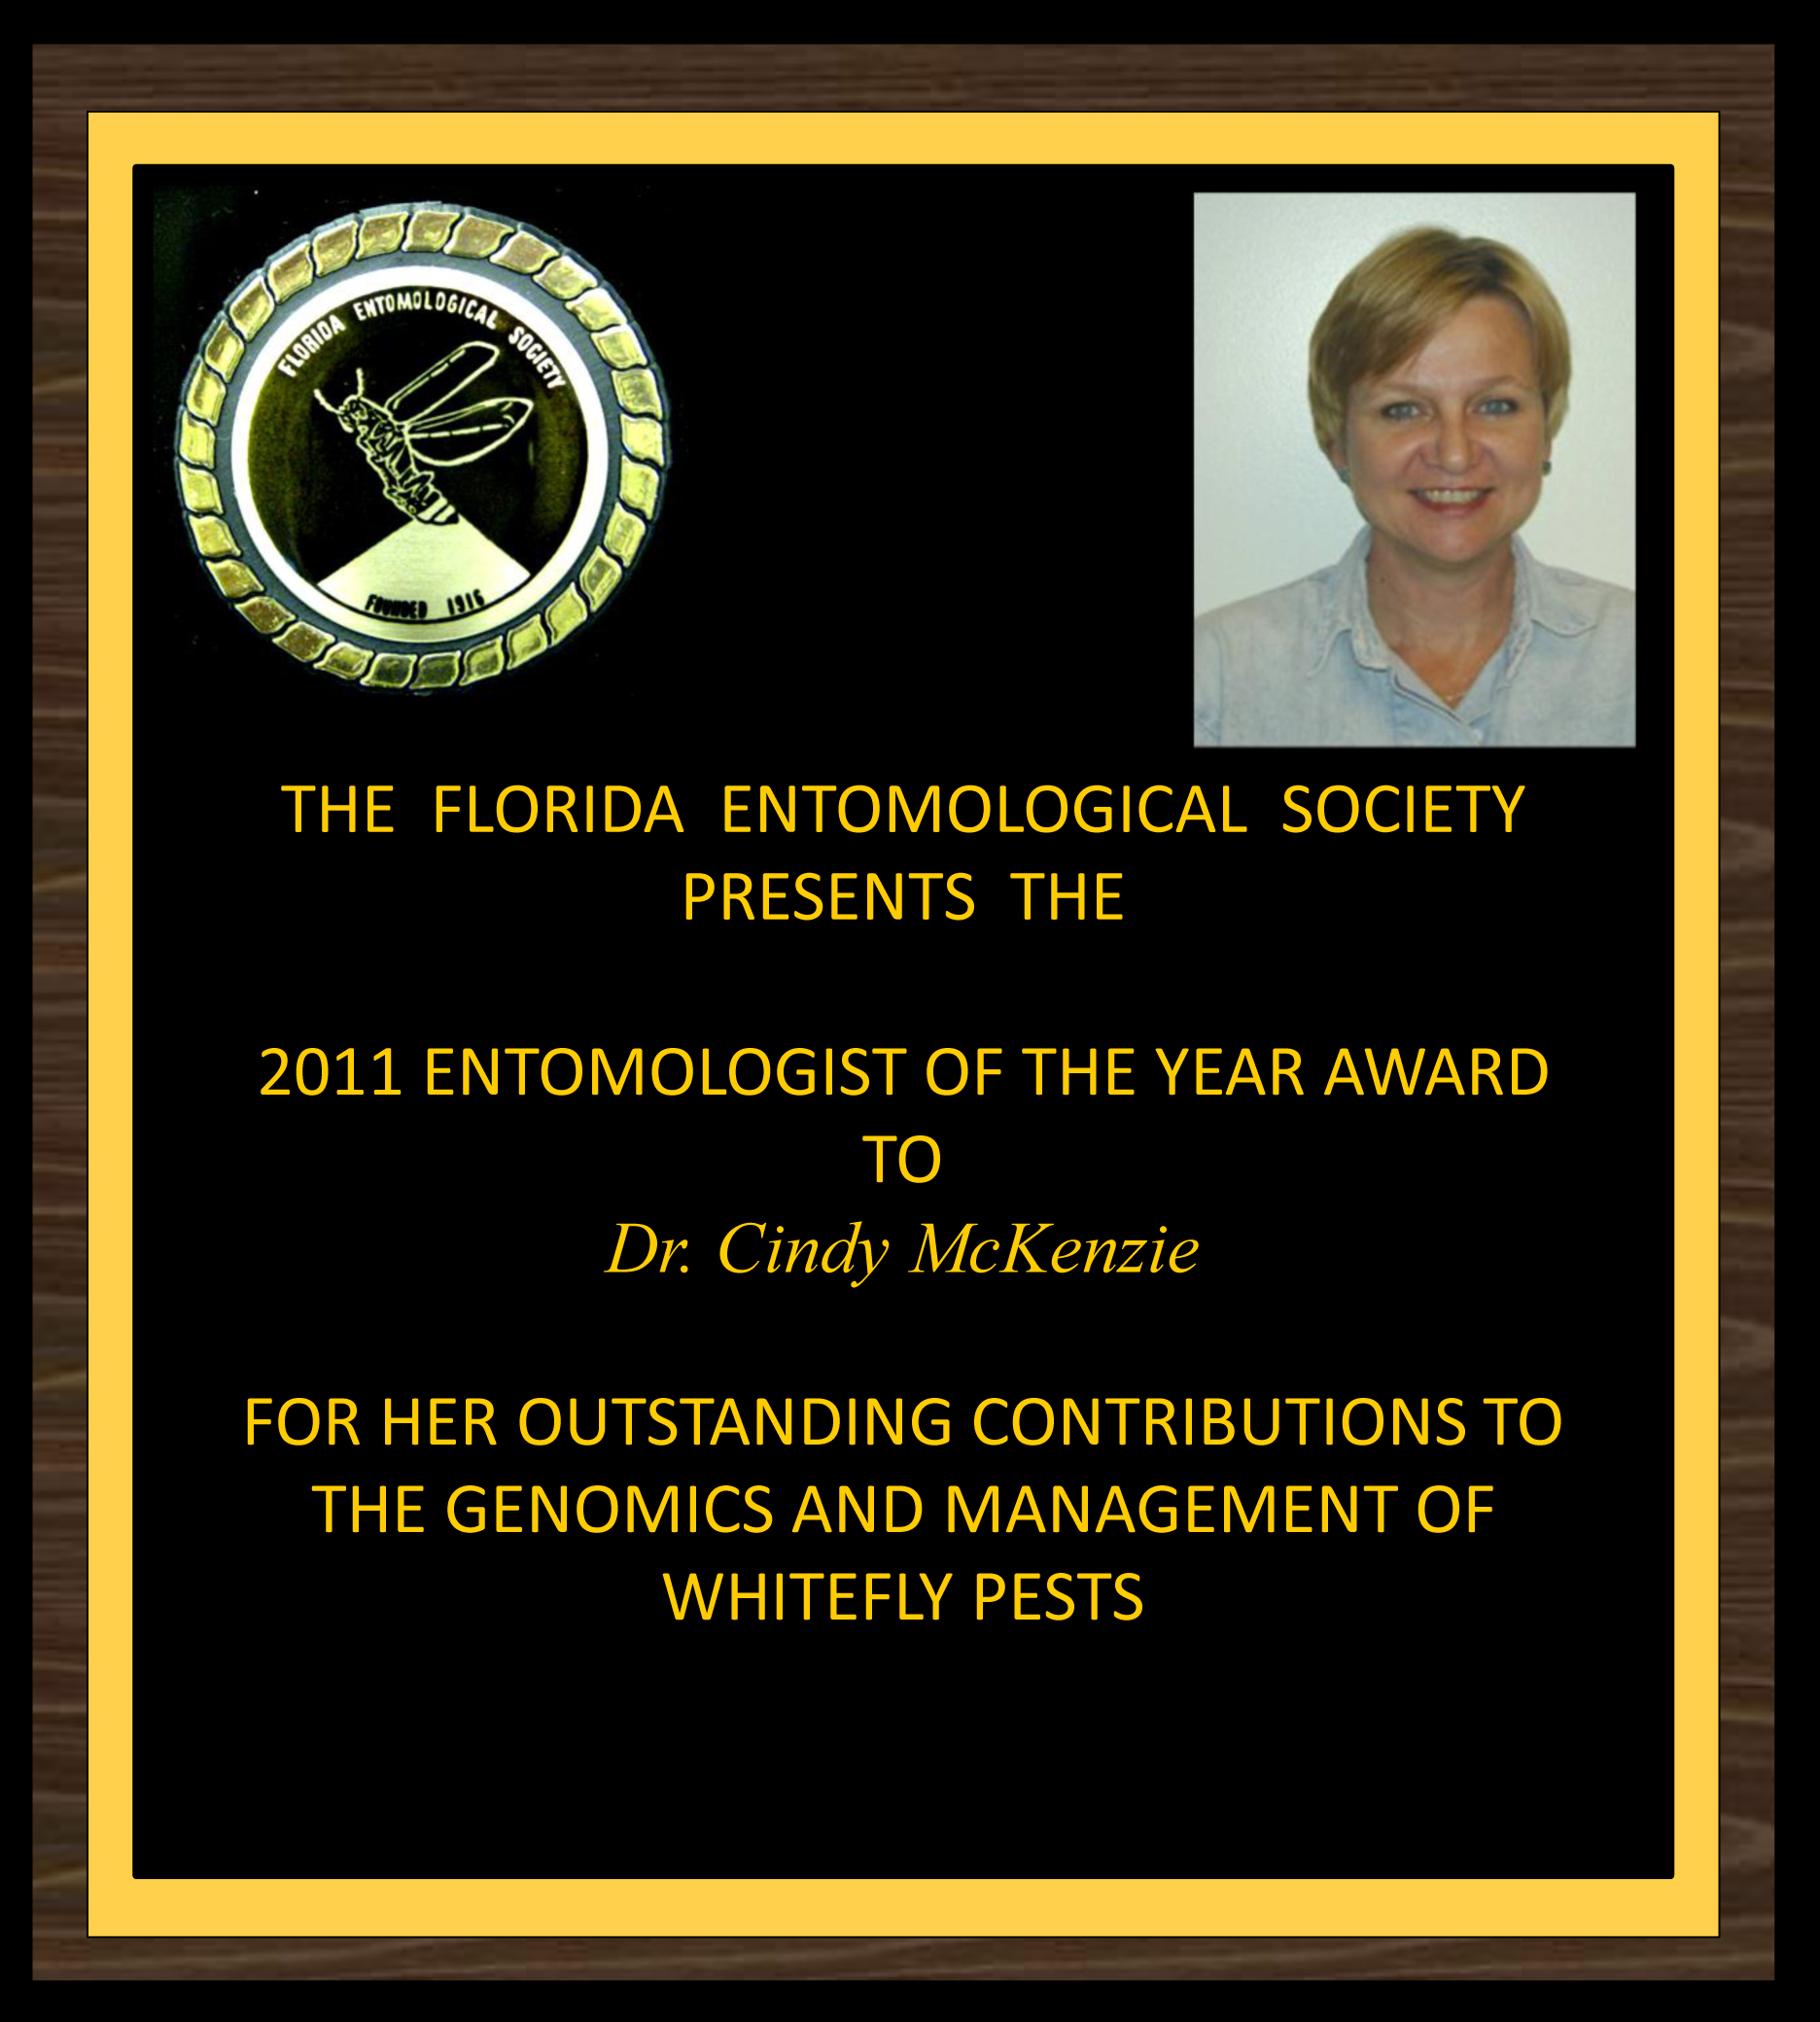 Cindy McKenzie wins 2011 FES Entomologist of the year award Award